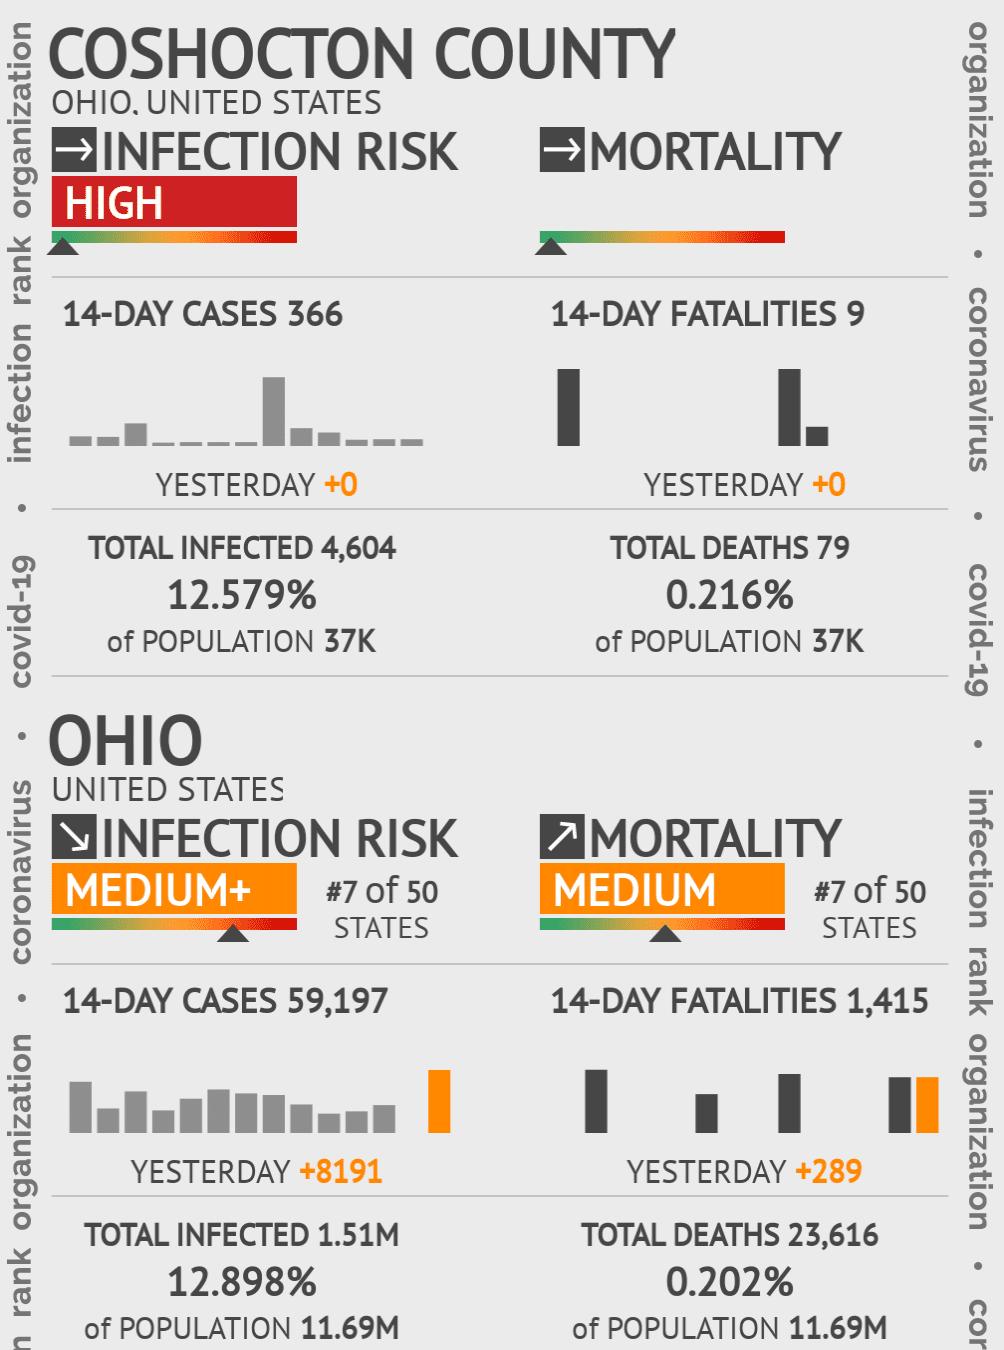 Coshocton County Coronavirus Covid-19 Risk of Infection on November 27, 2020